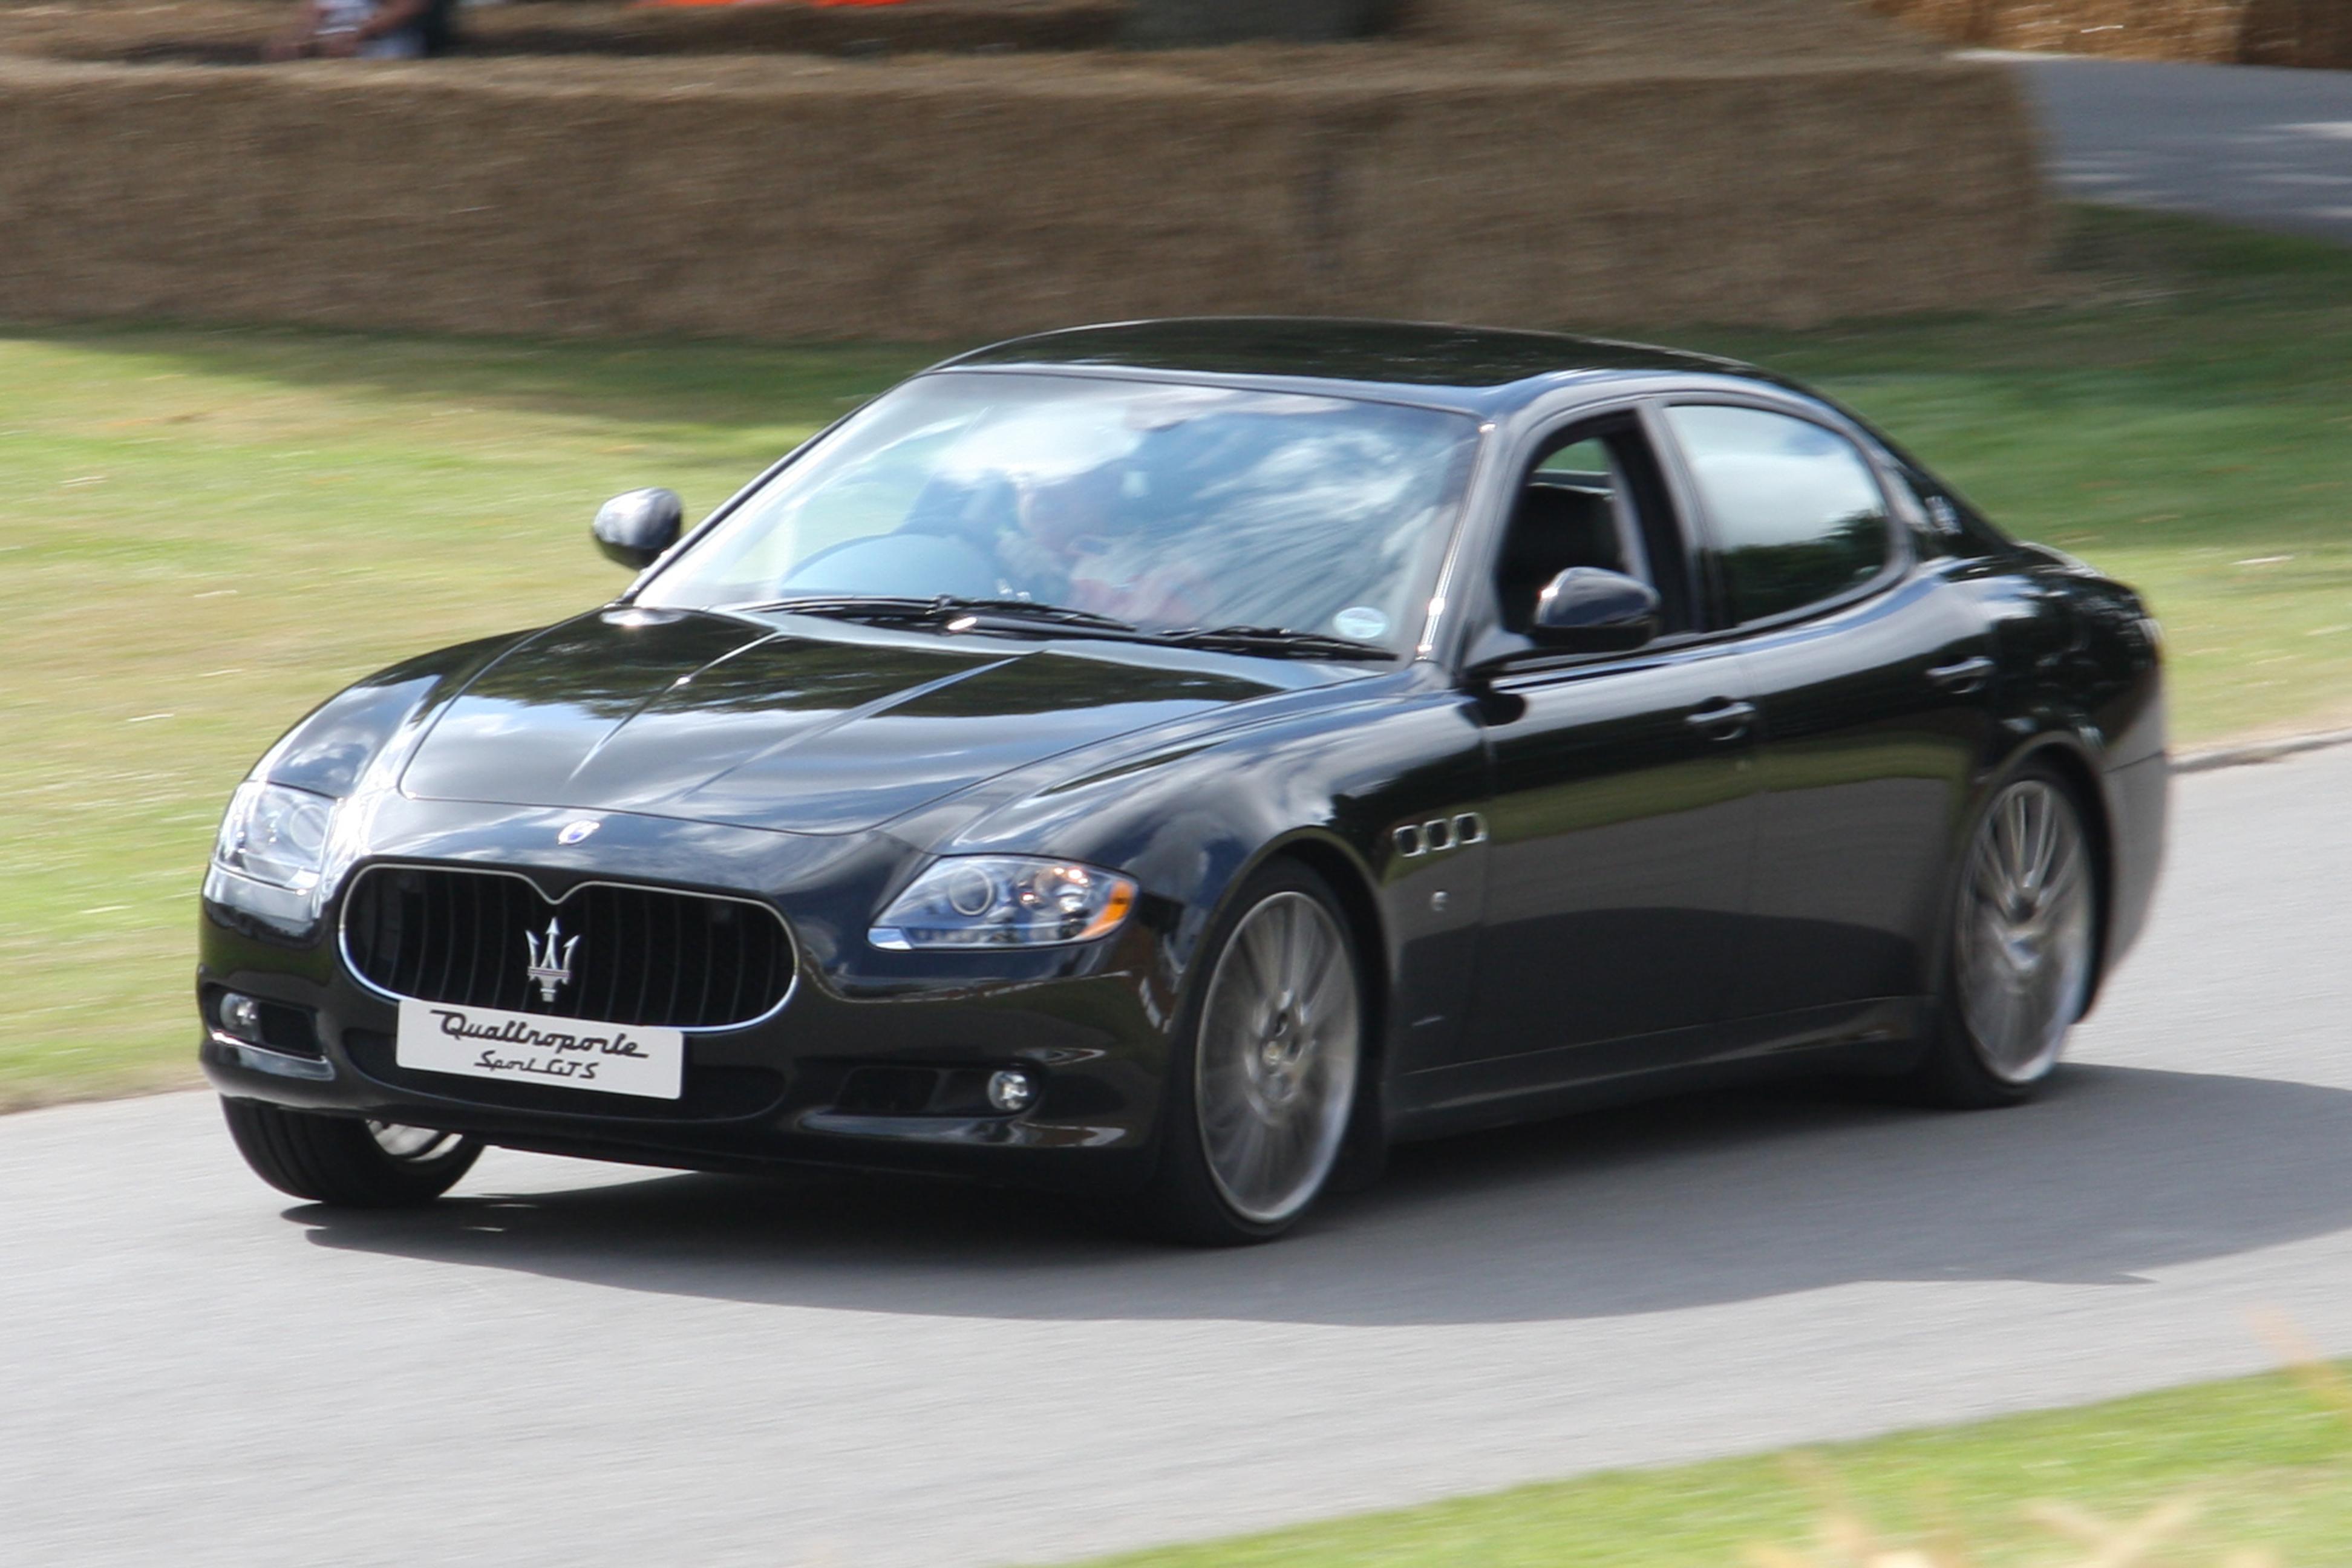 File:2009 Maserati Quattroporte Sport GT S - Flickr - exfordy.jpg ...